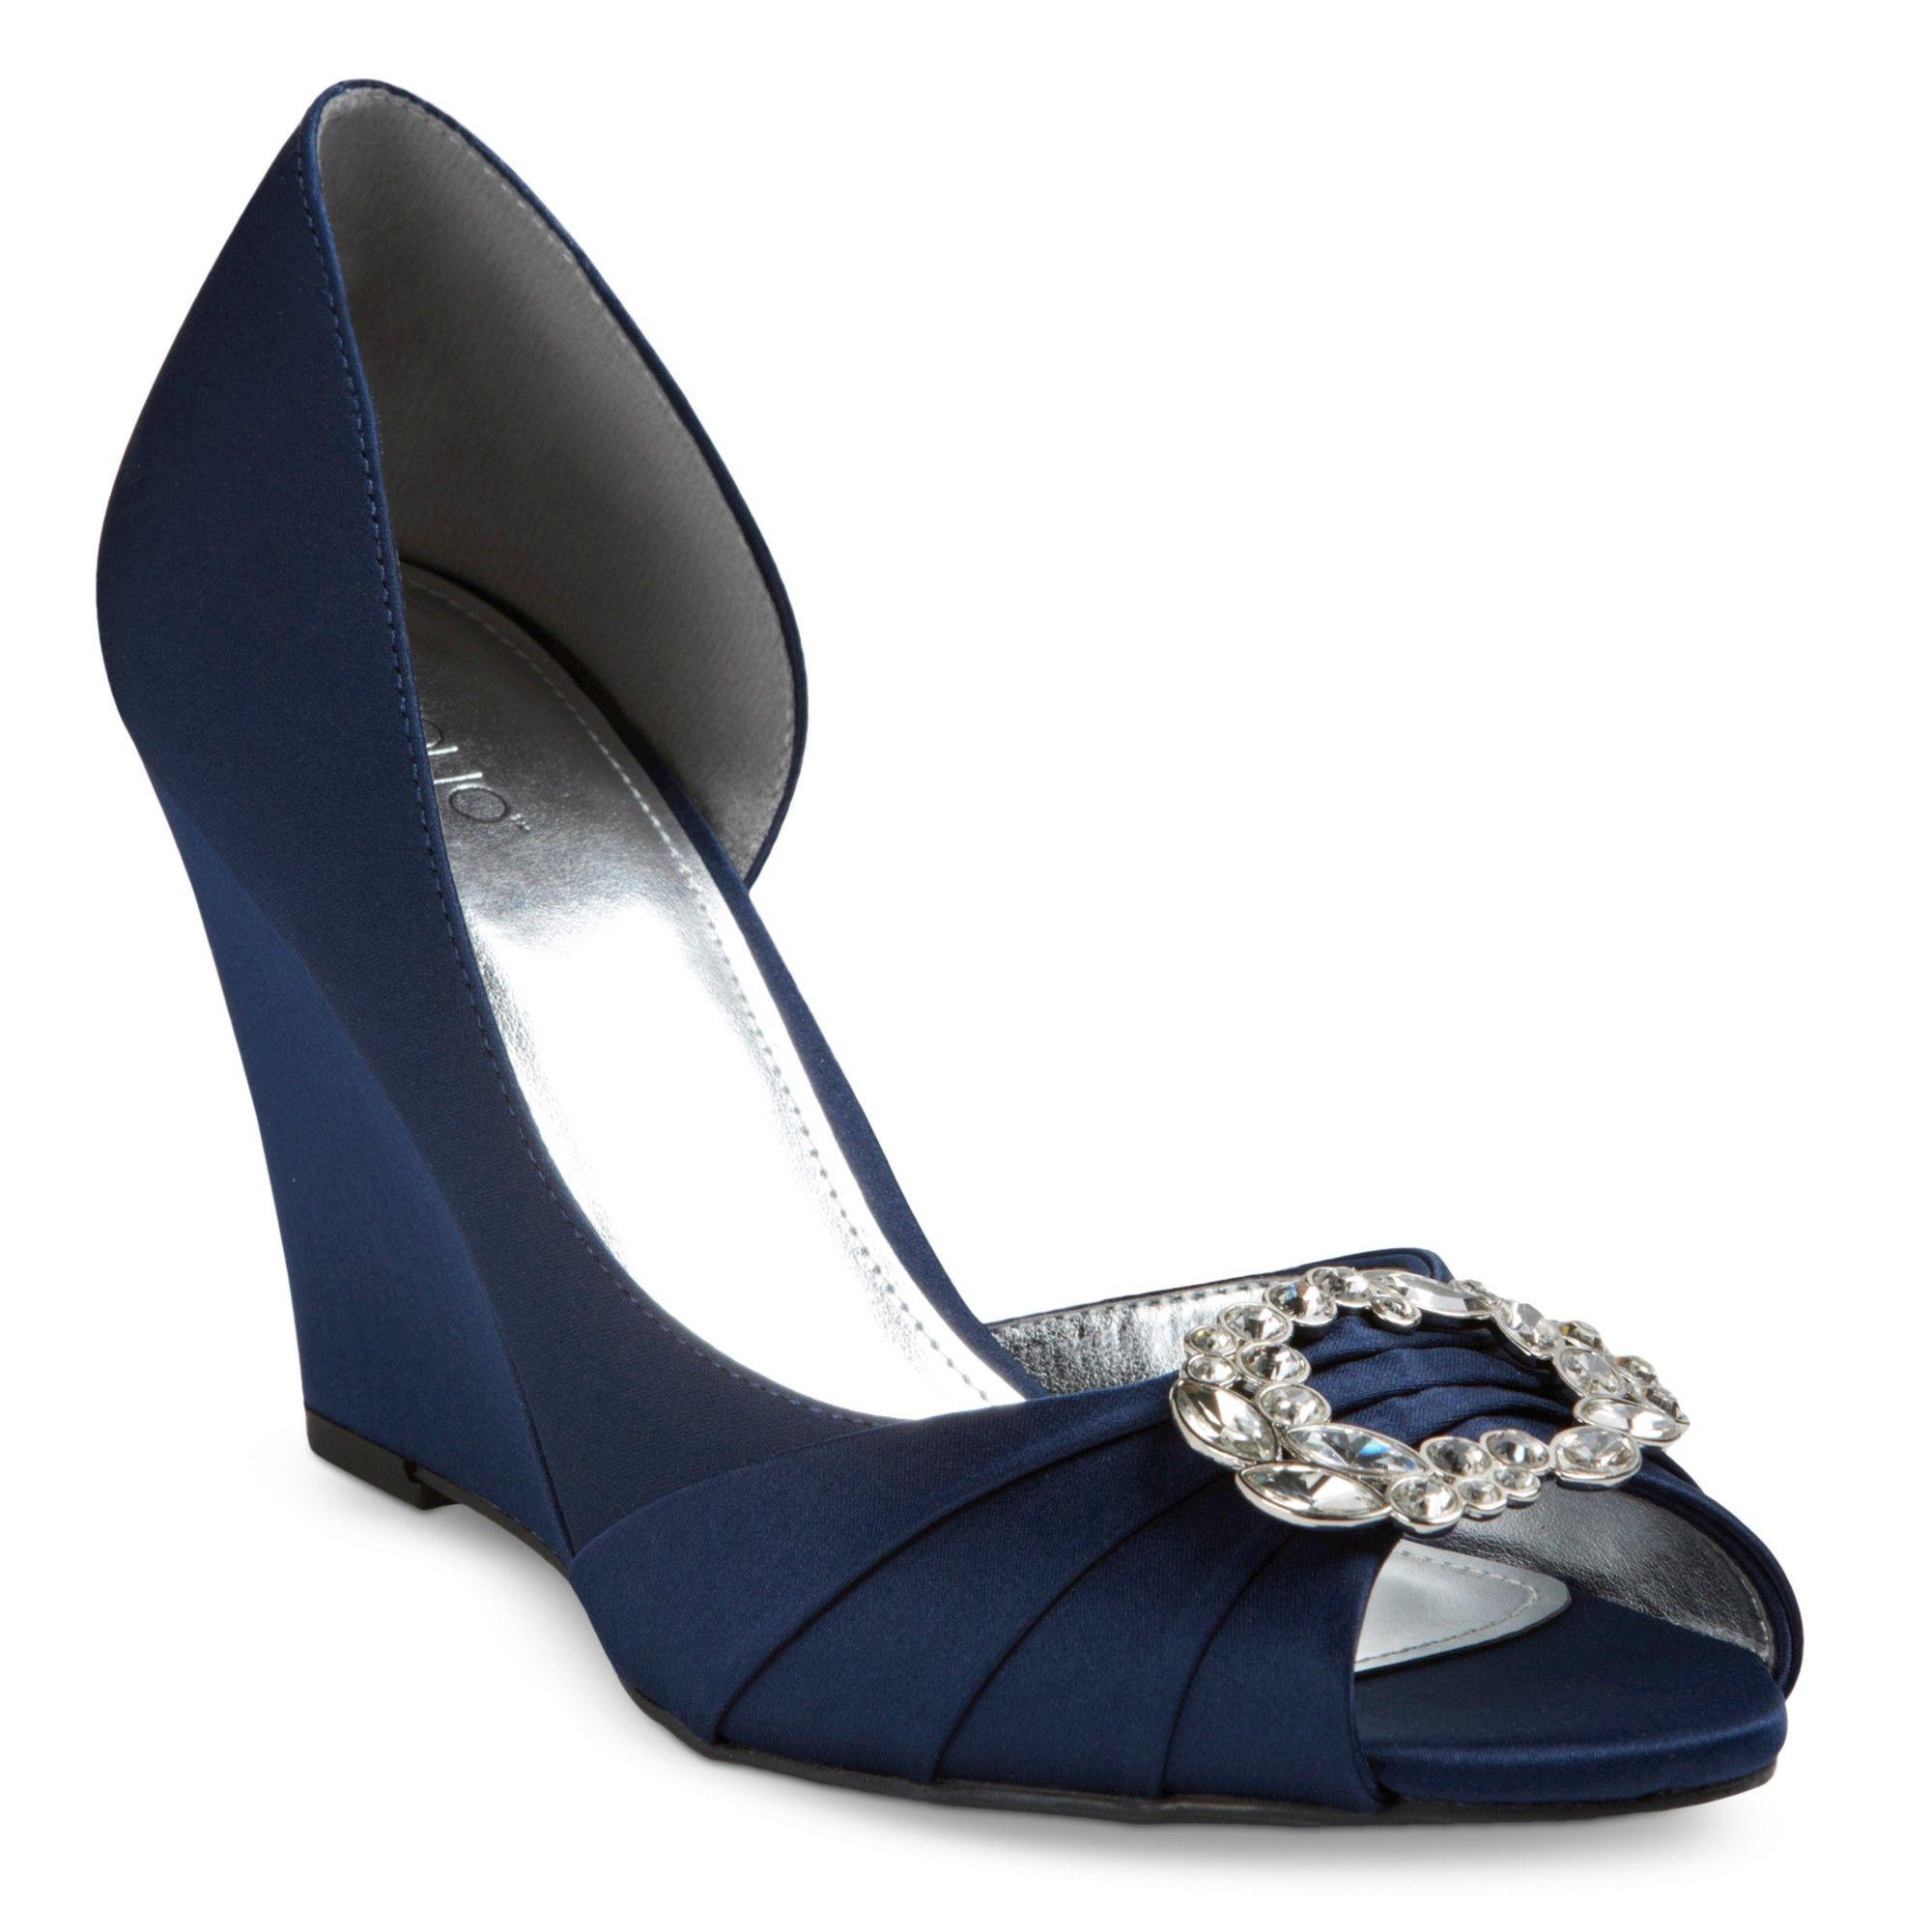 Navy blue dress shoes for wedding  Womenus Amalia Peep Toe Satin Wedge Pumps  Tevolio Navy Blue